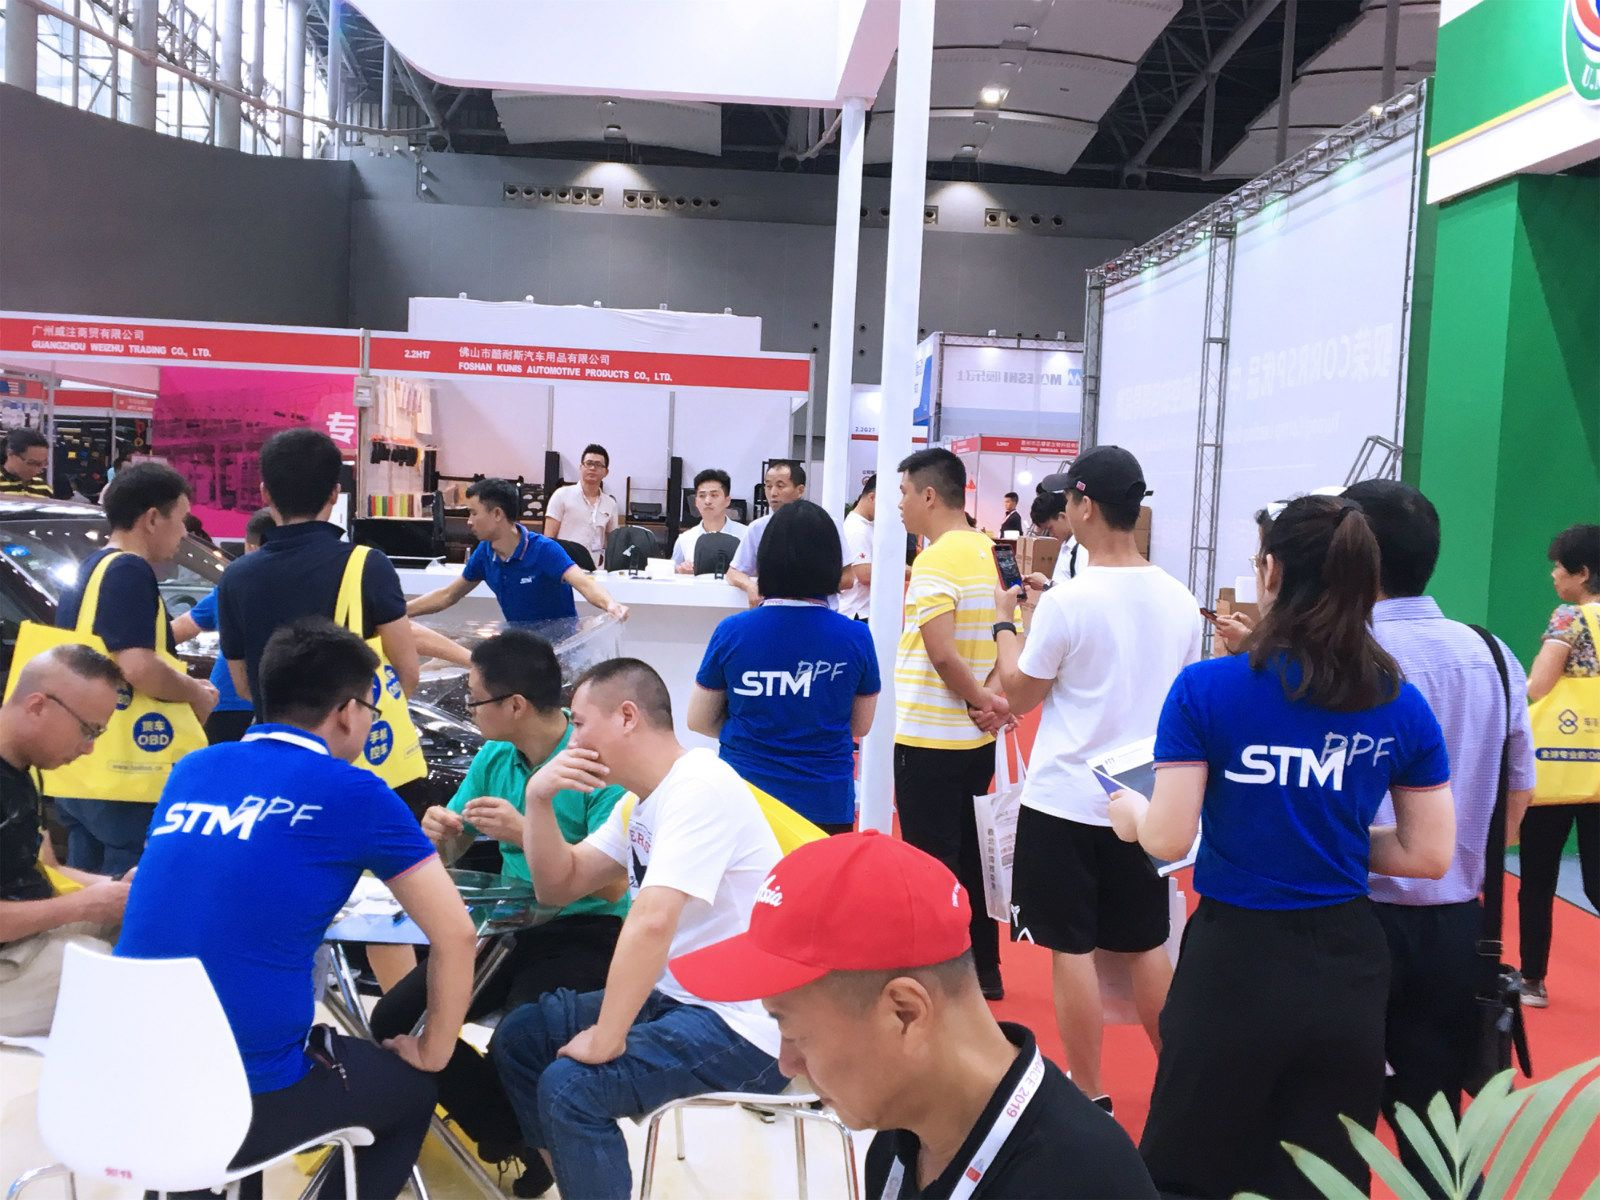 STM PPF汽车漆面膜成功参展雅森展会